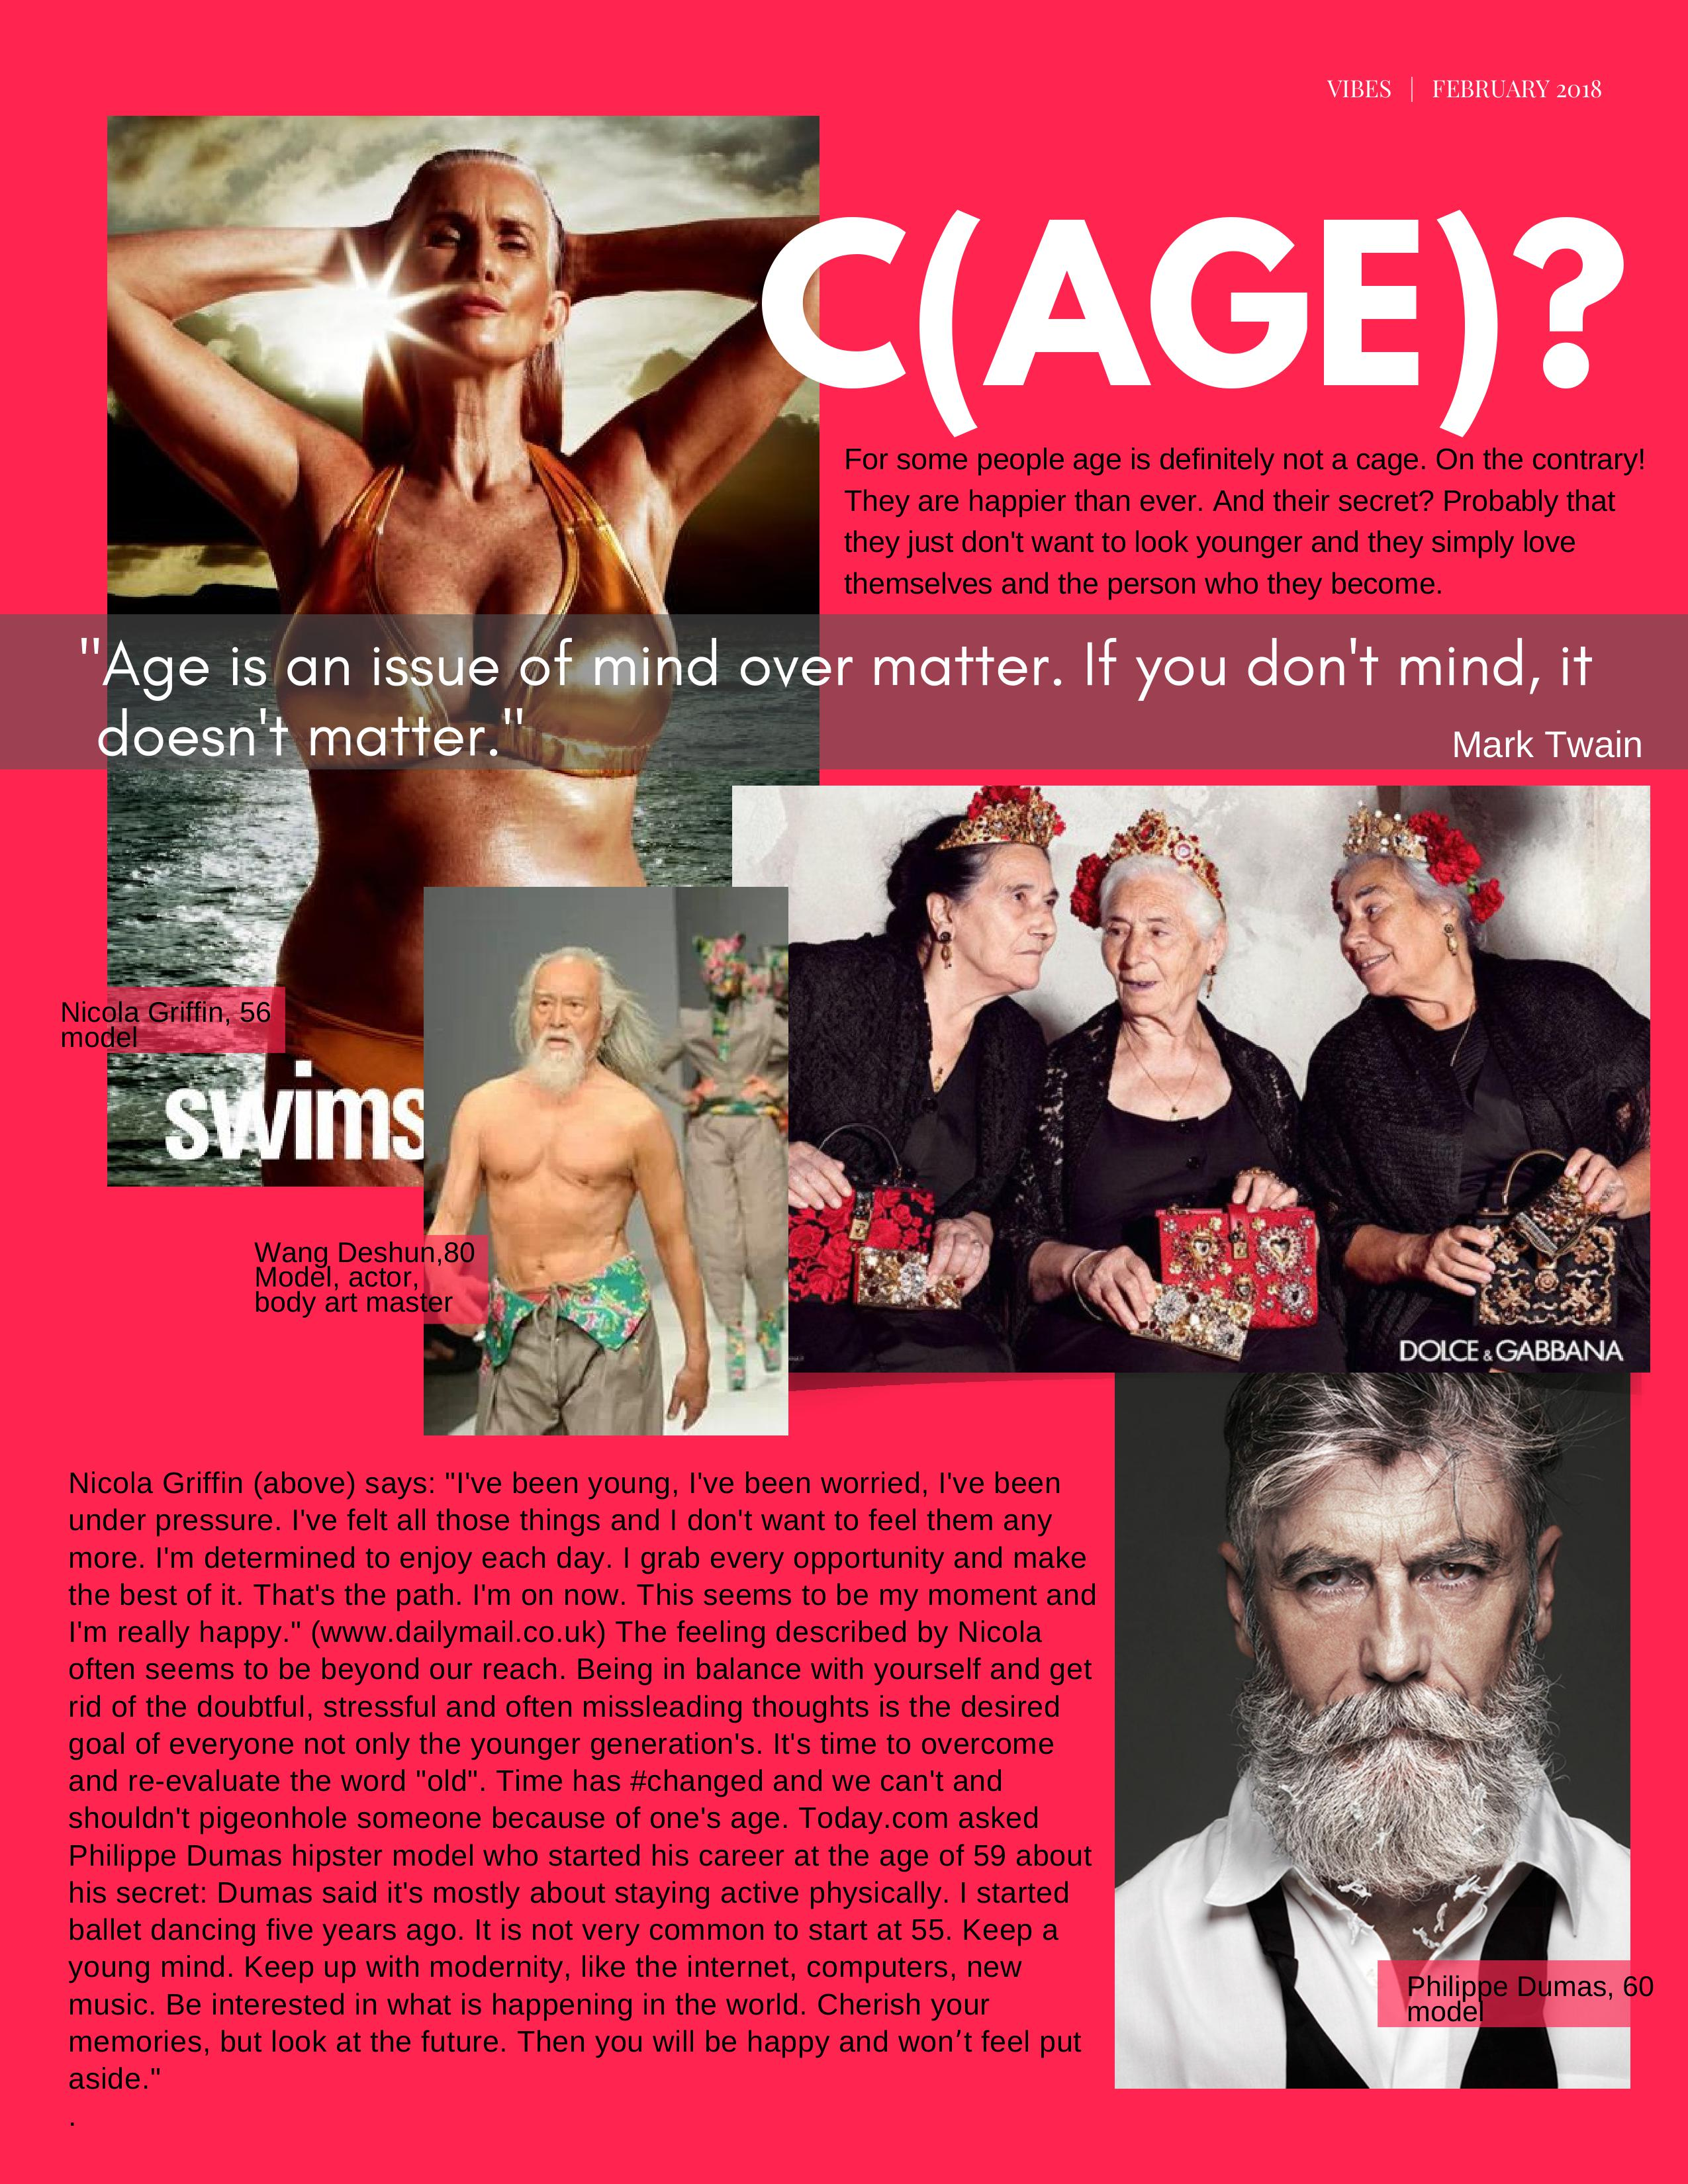 Vibes Magazine Hungary - Cage